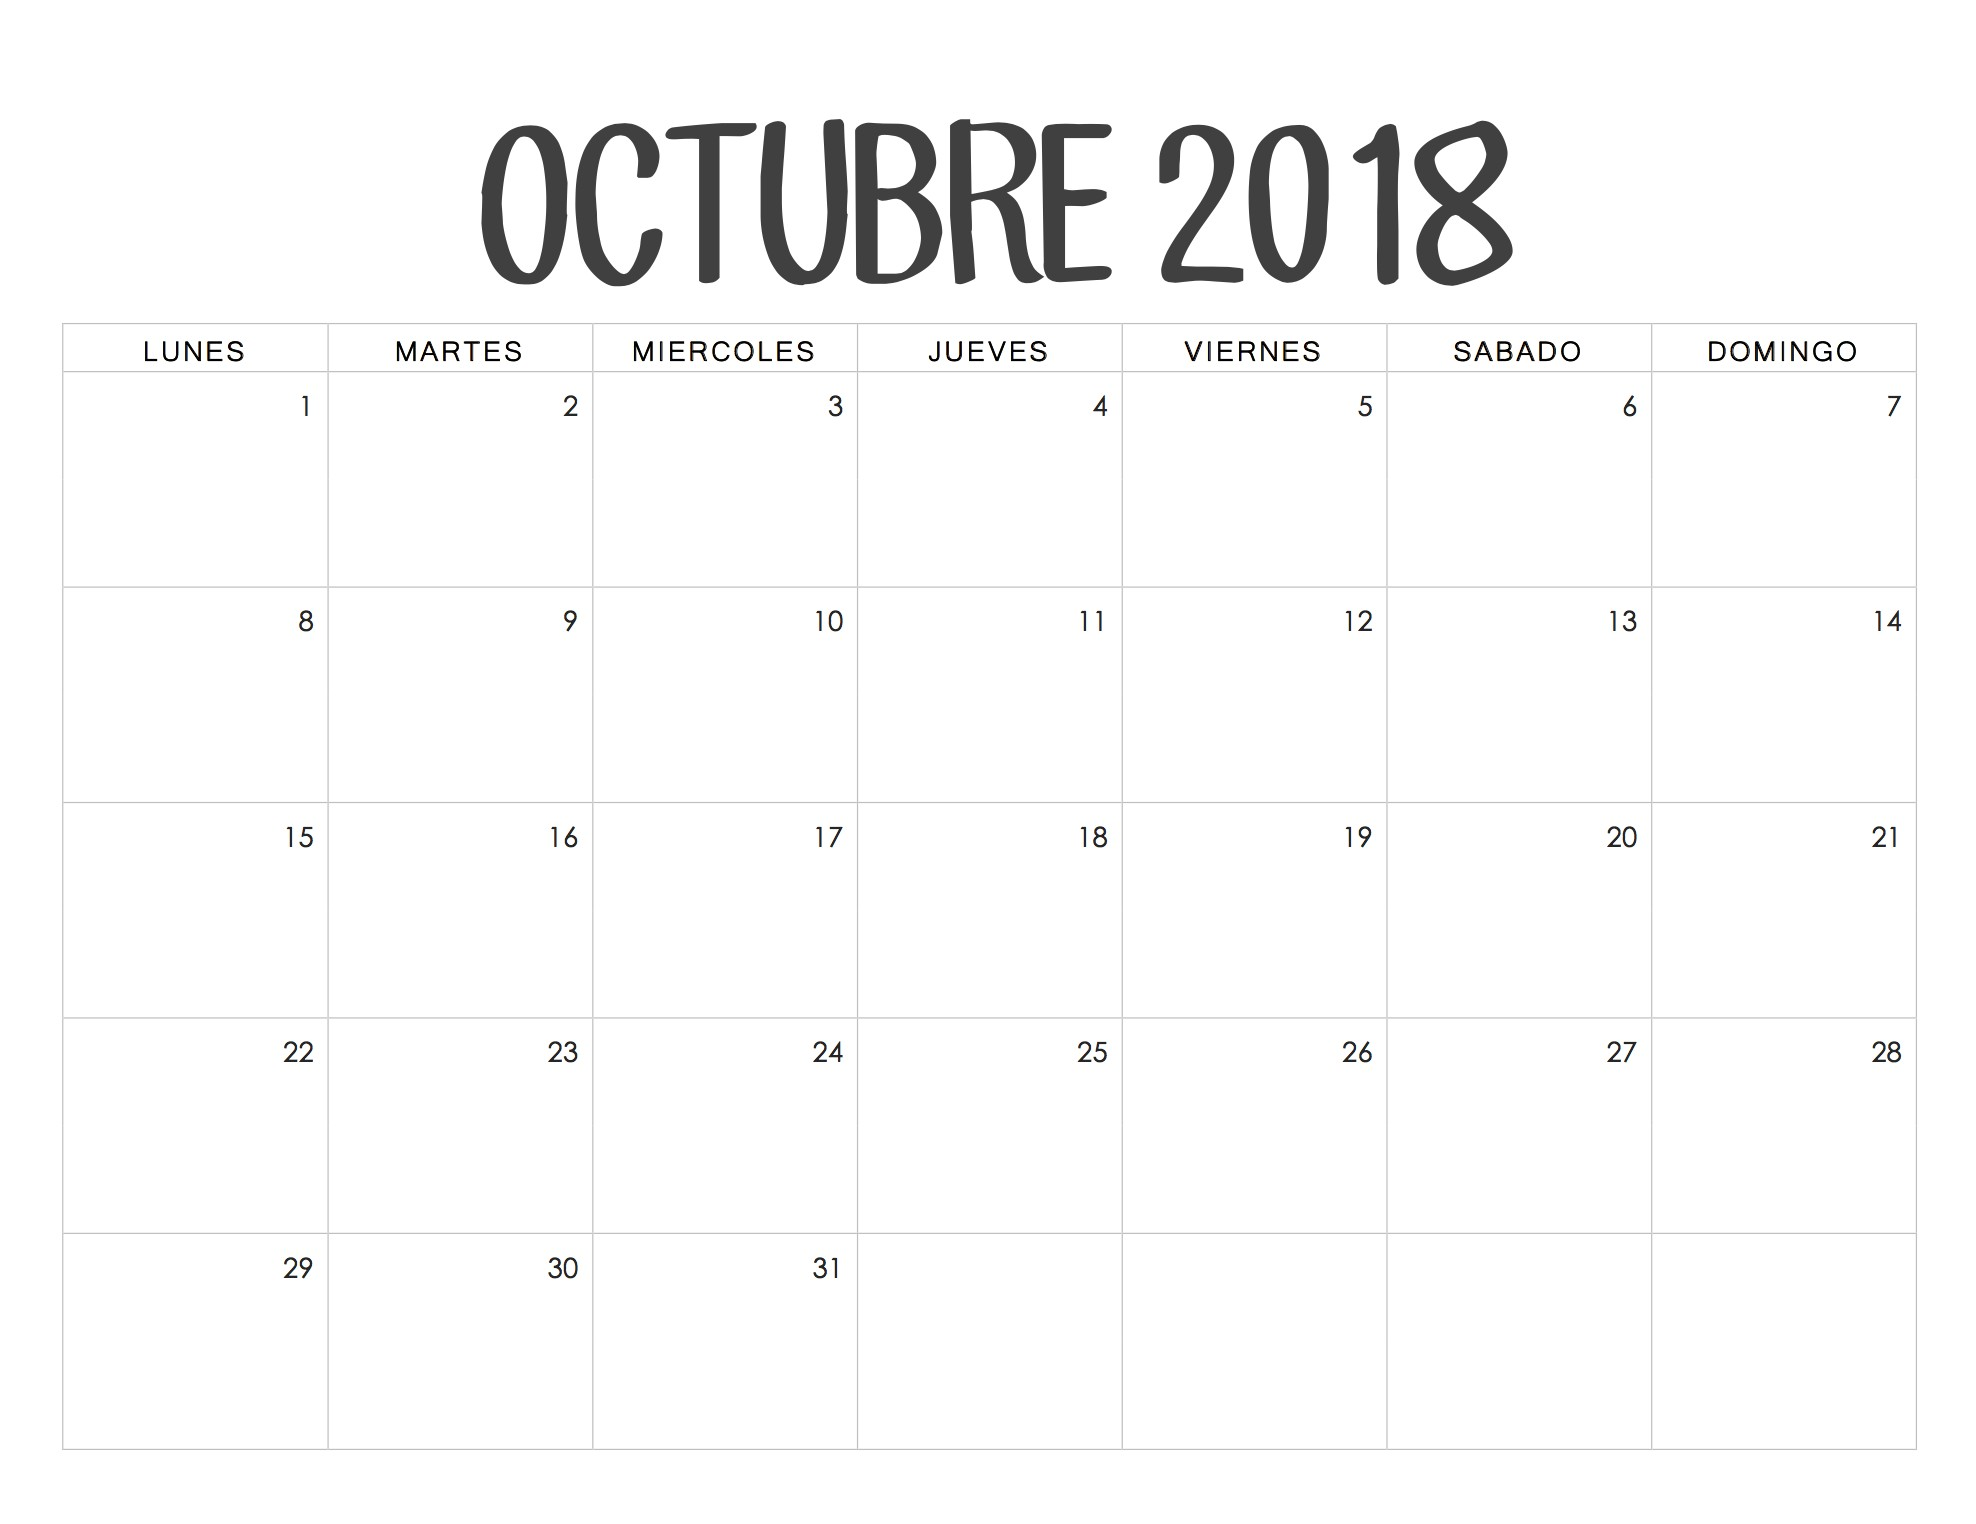 Calendario Octubre 2018 Para Imprimir Calendario 2018 Excel Days And Months Bullet Journal